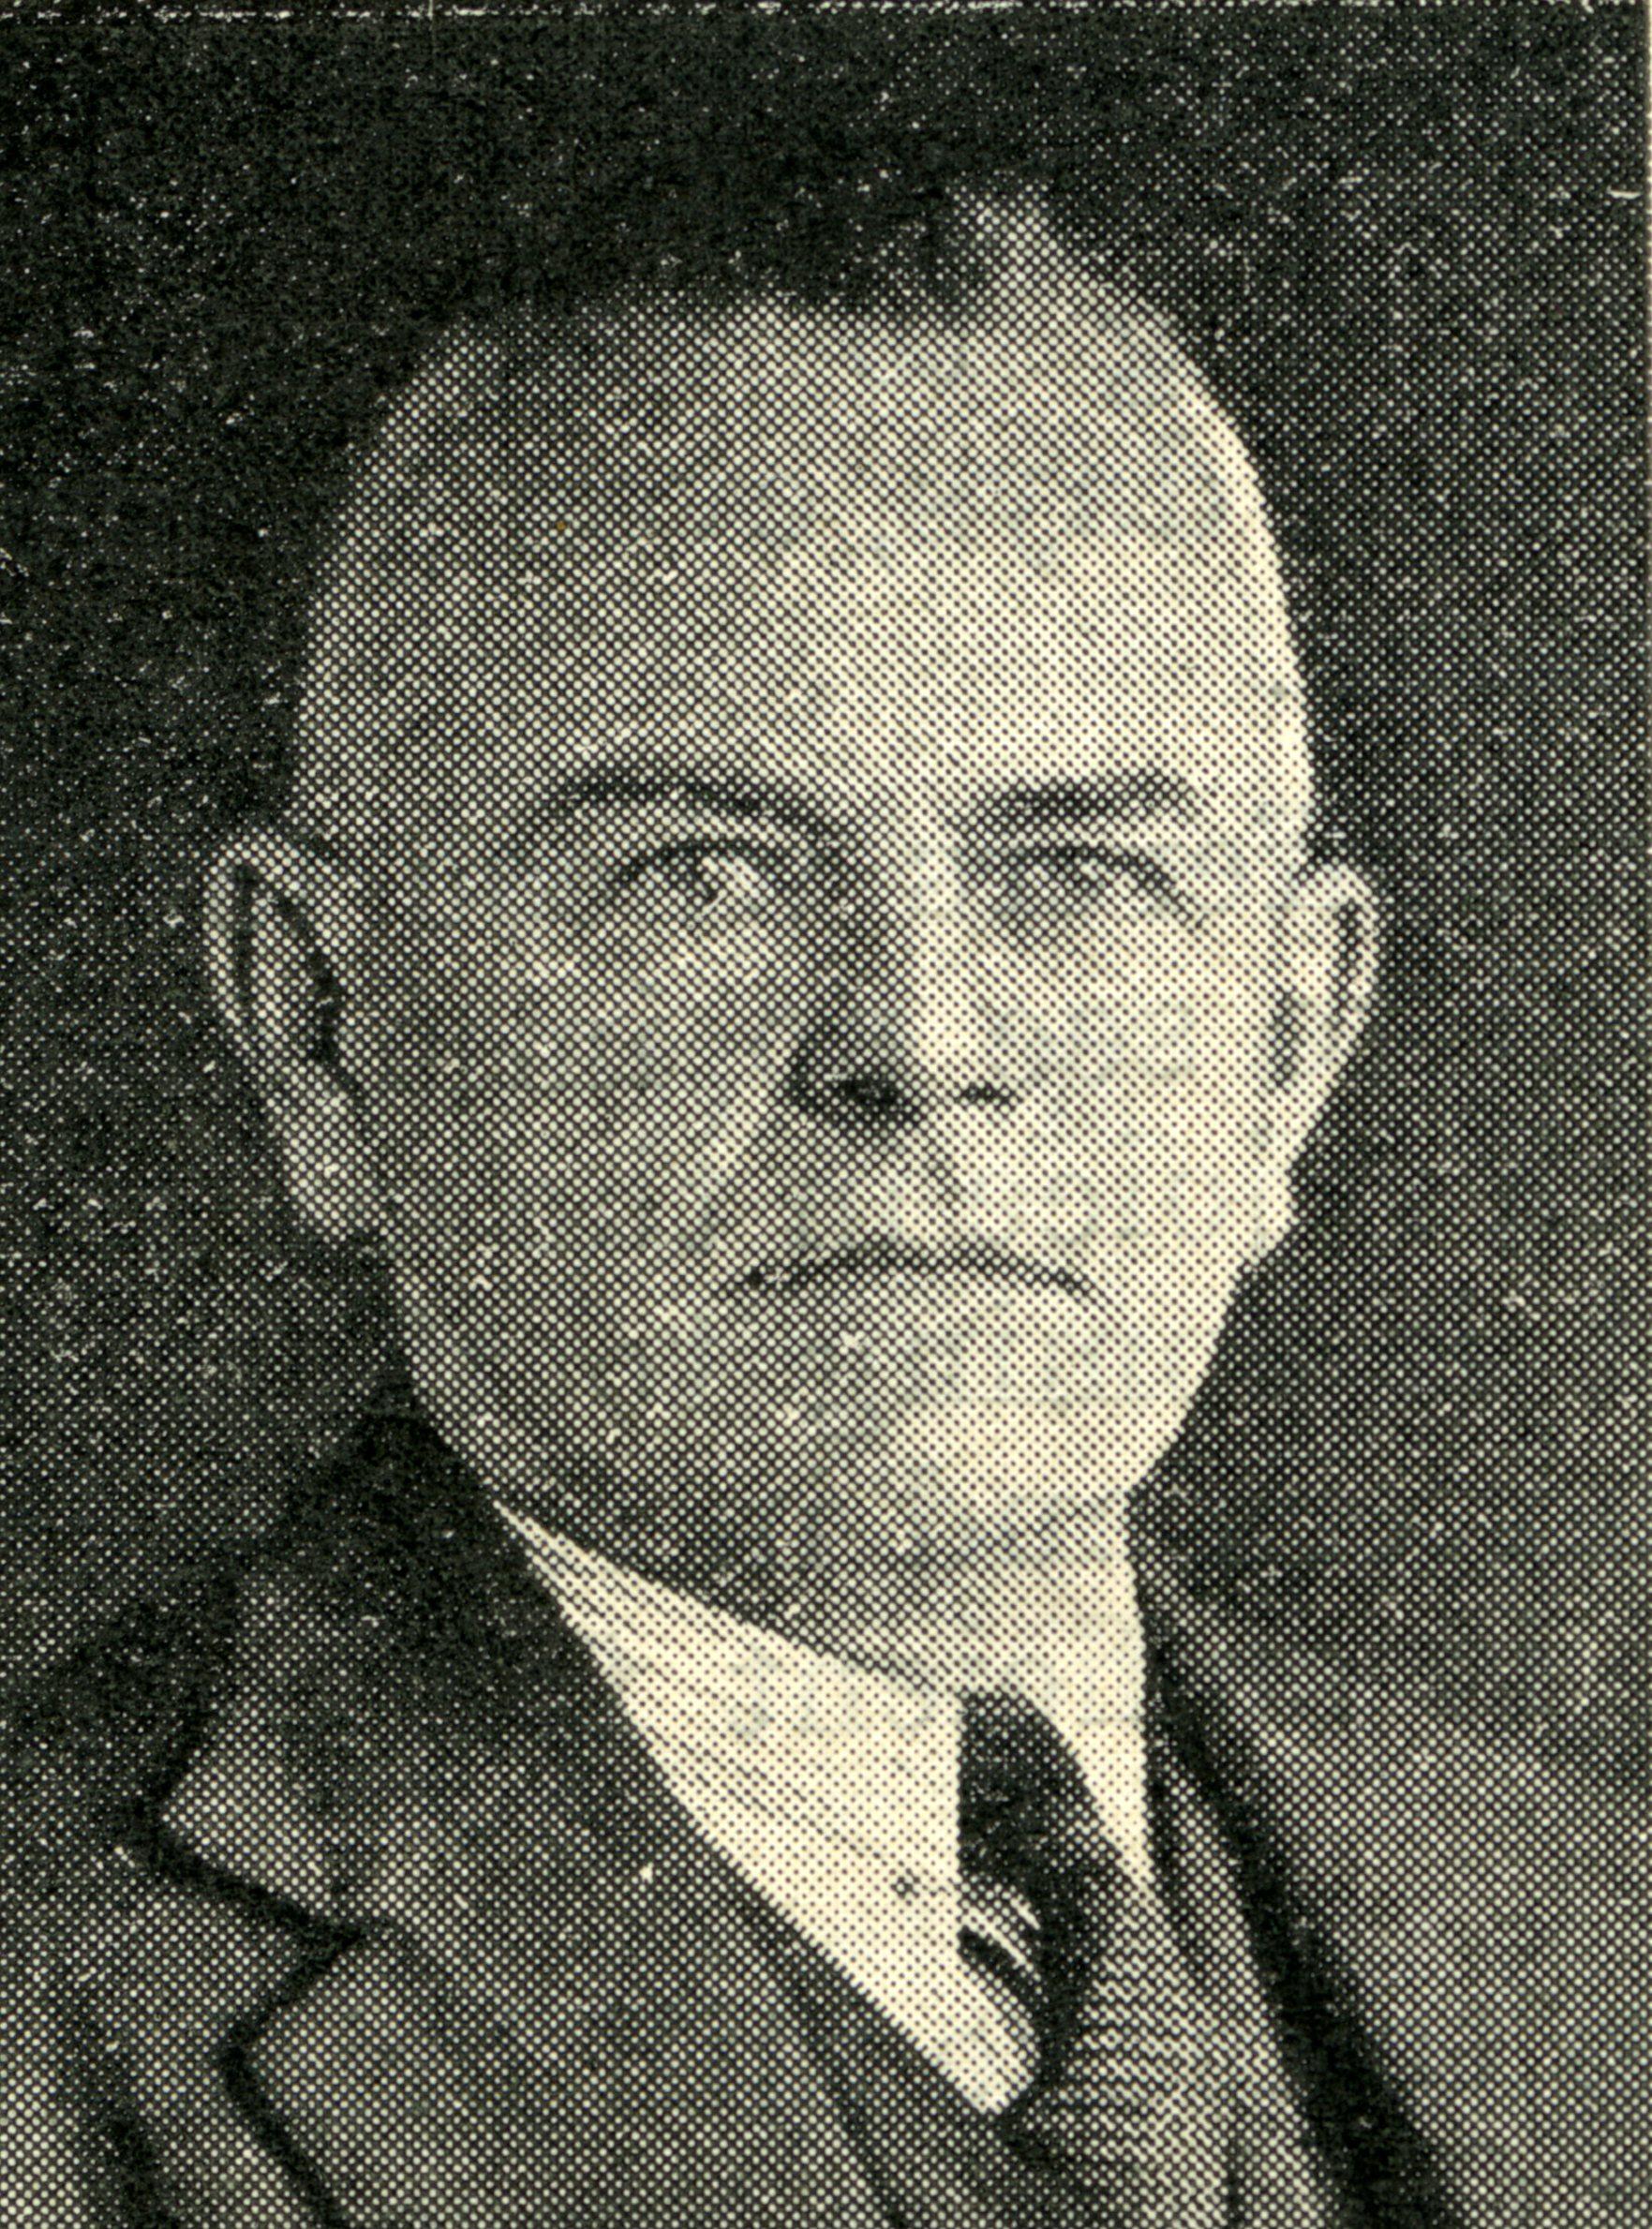 Gordon Winn